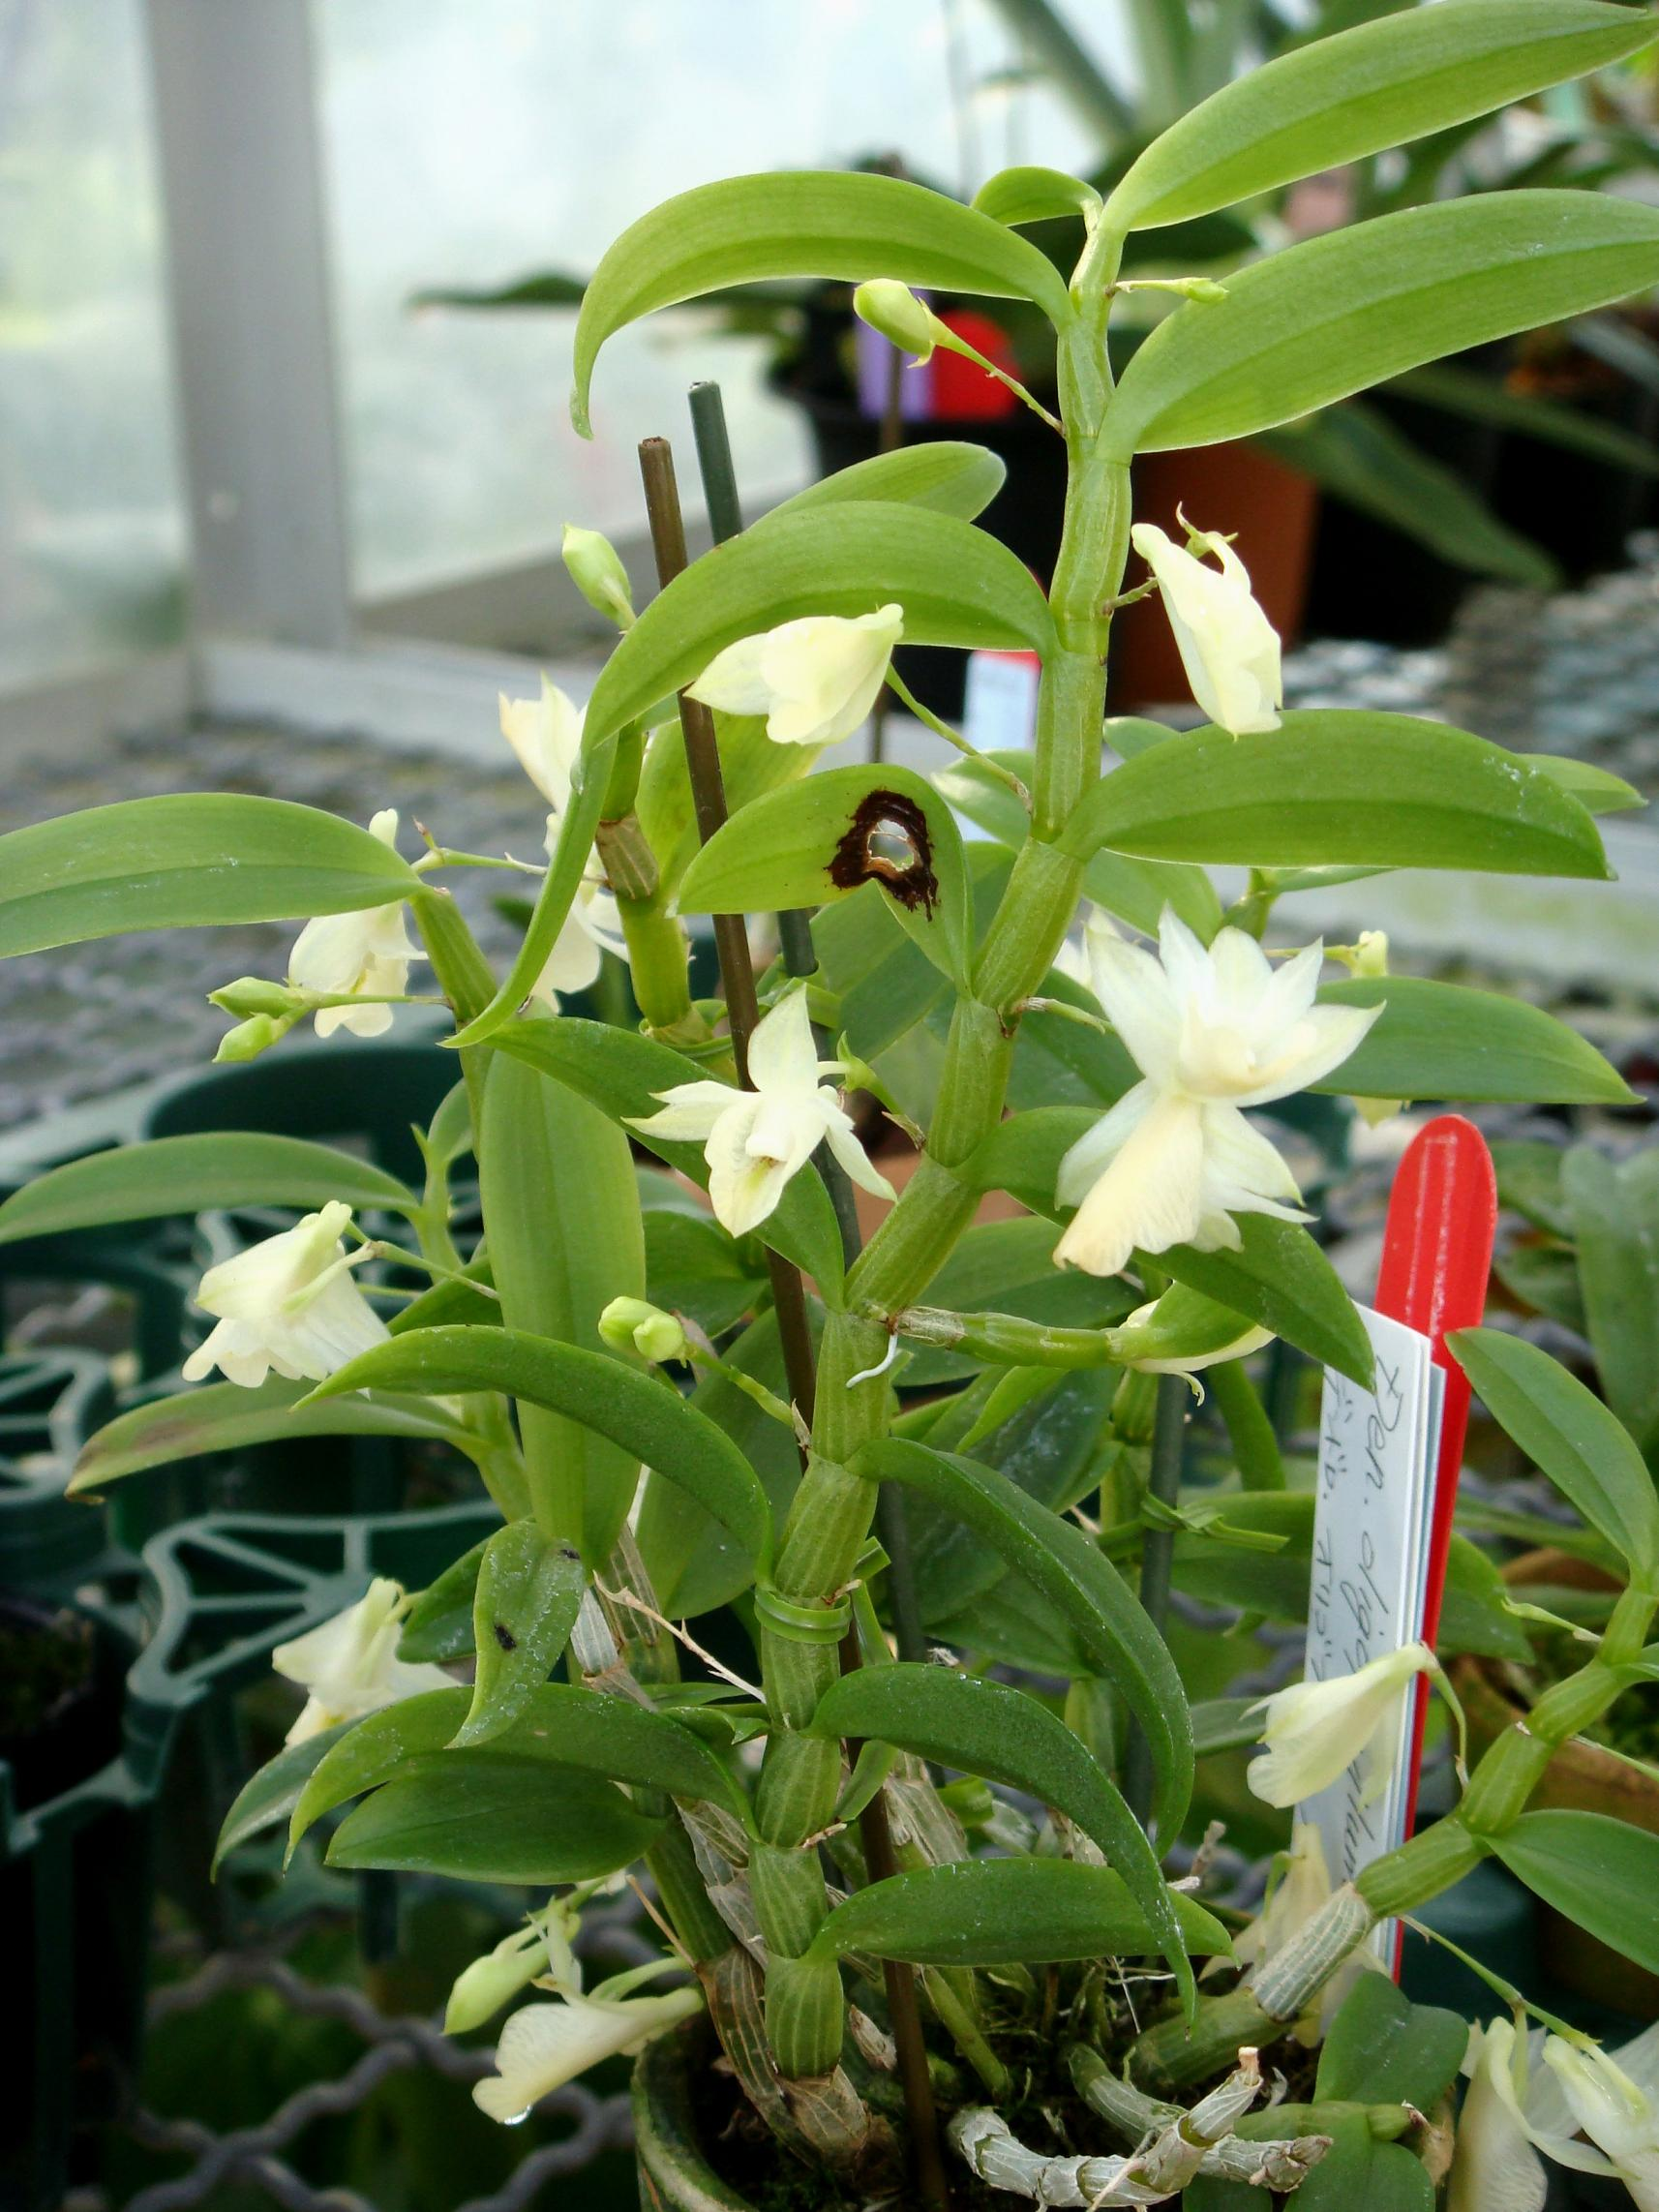 http://orchids.la.coocan.jp/Dendrobium/Dendrobium%20oligophyllum/DSC03696.JPG